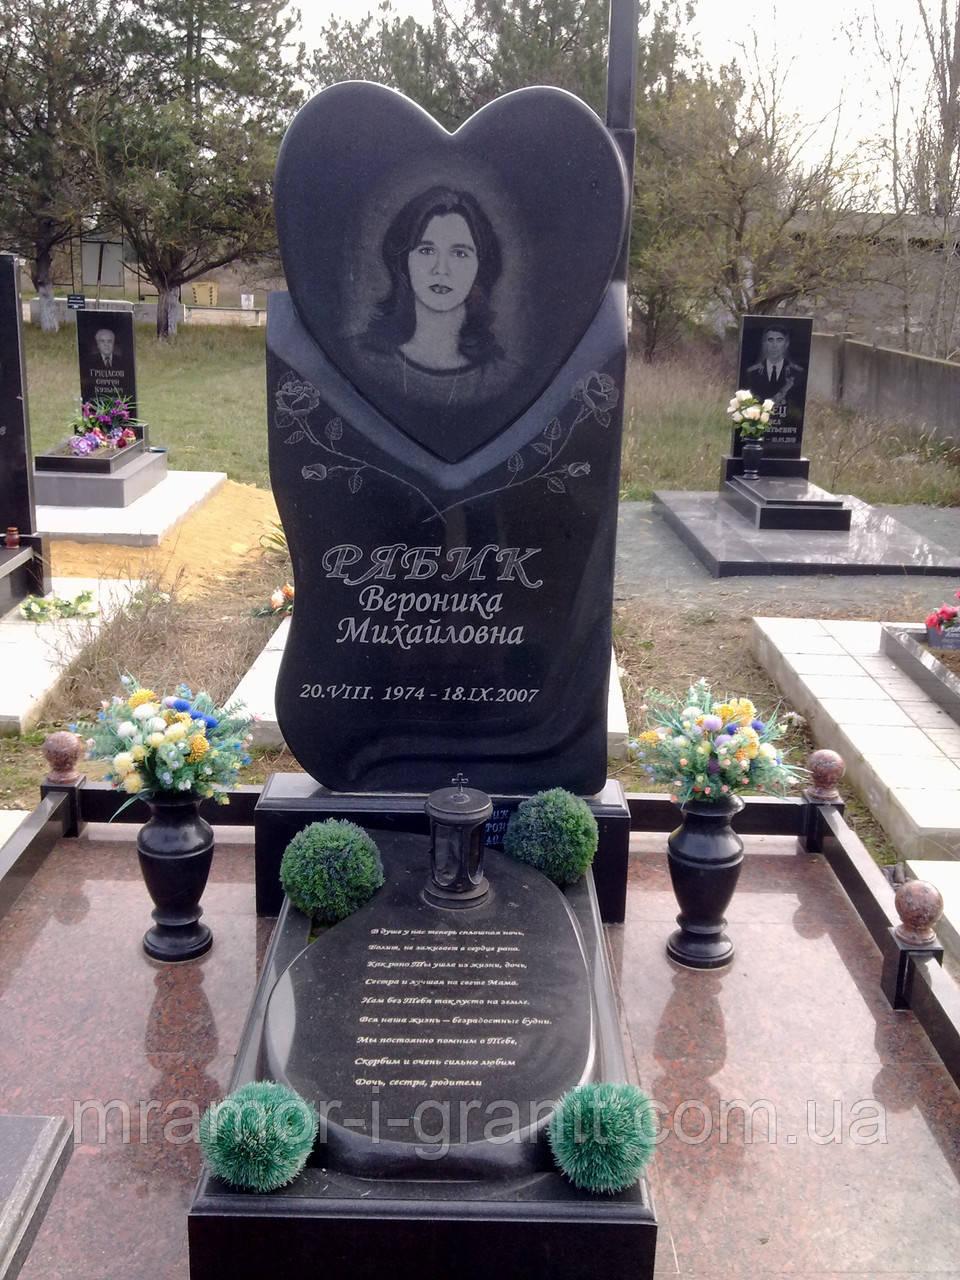 Цена на памятники надгробия у 2018 стих на 40 дней после смерти другу